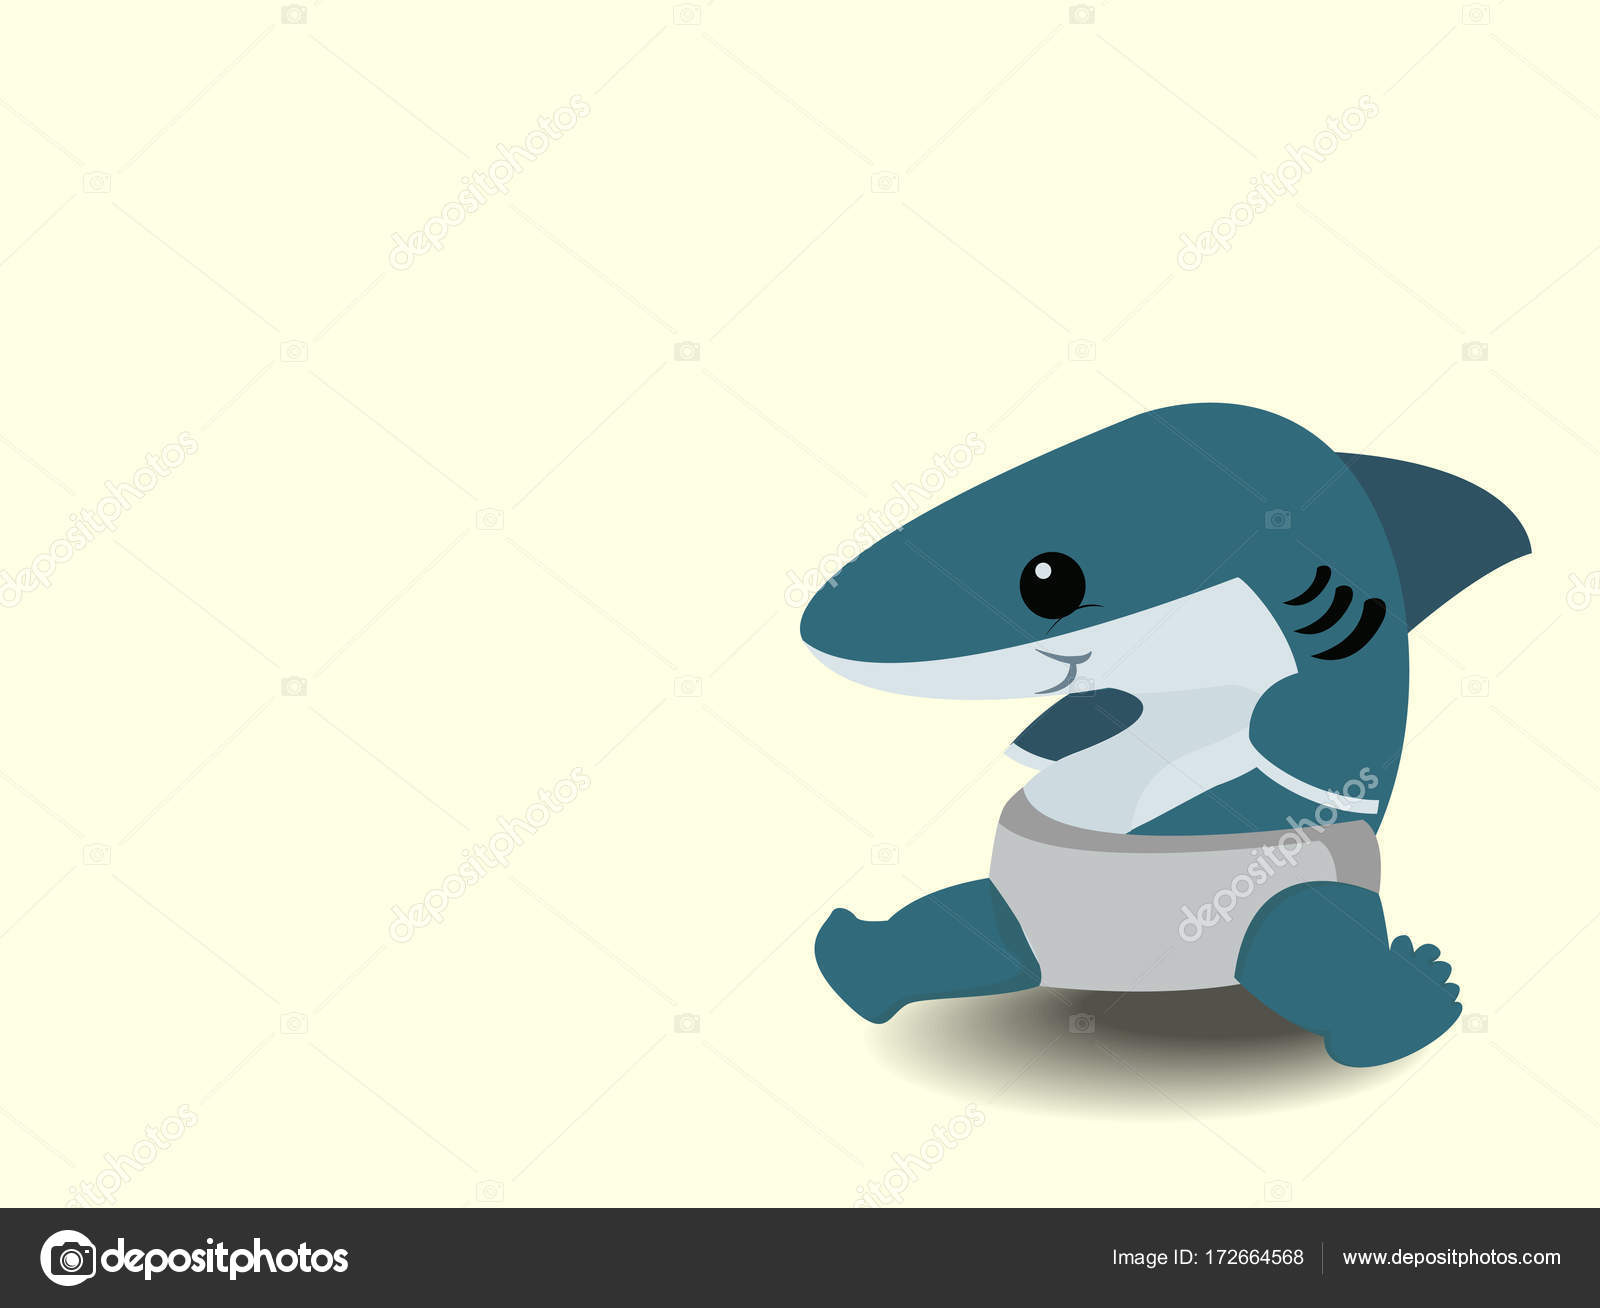 Fotos Tiburon Bebe Tiburon De Dibujos Animados Lindo Bebe